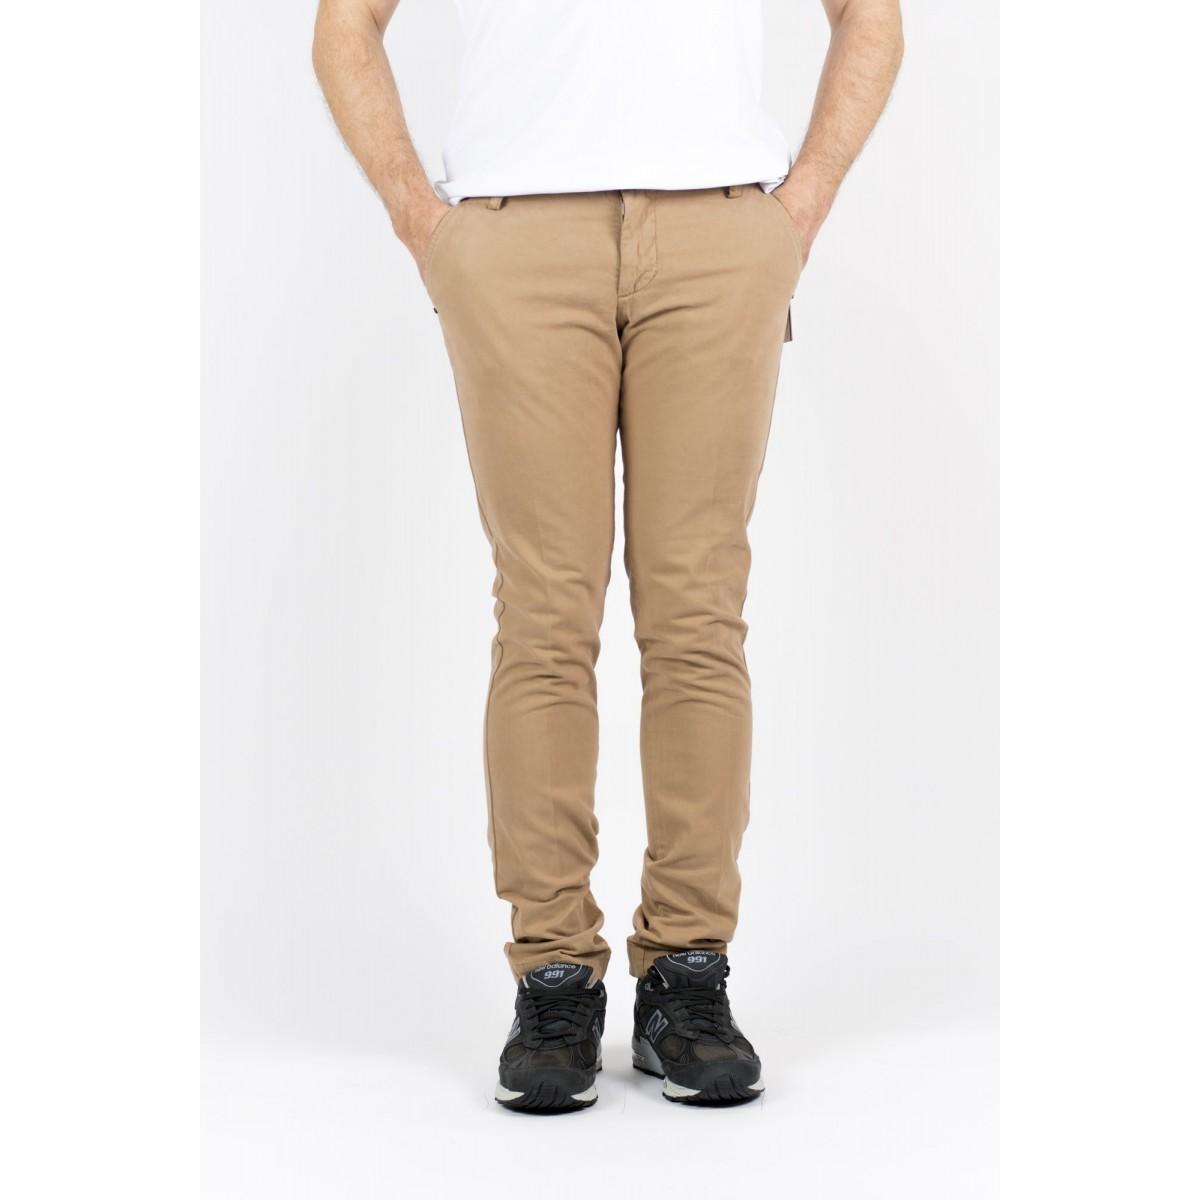 Trousers Entre Amis Man - A15 8201 504 - Nocciola